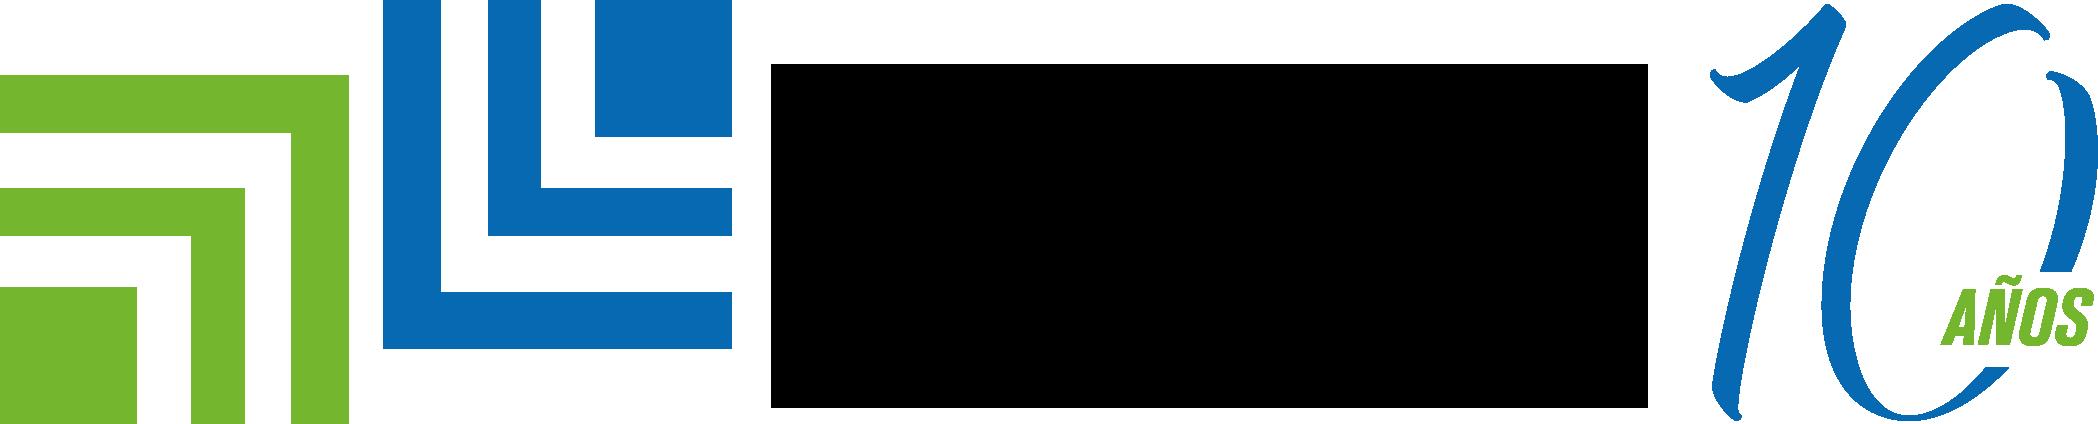 Logotipo de Coaser